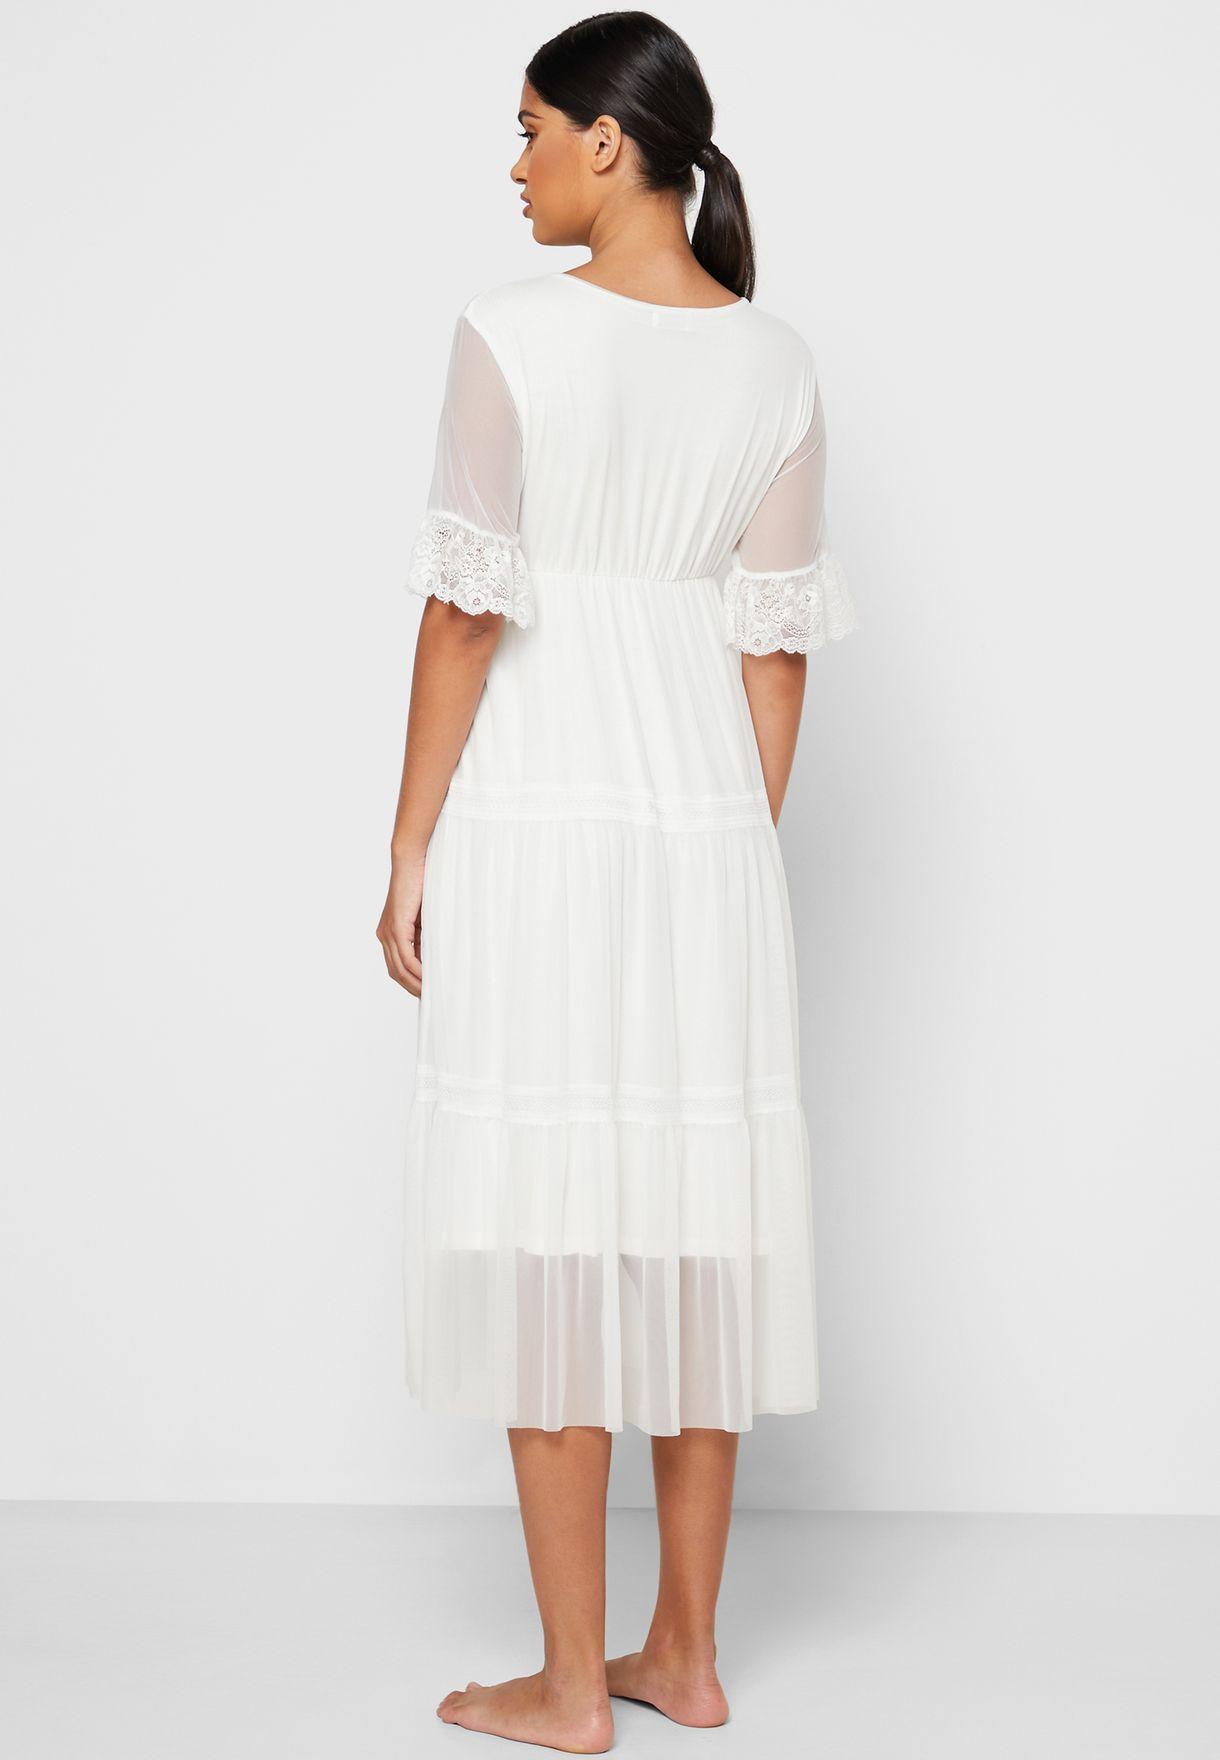 Lace Trim Tiered Nightdress